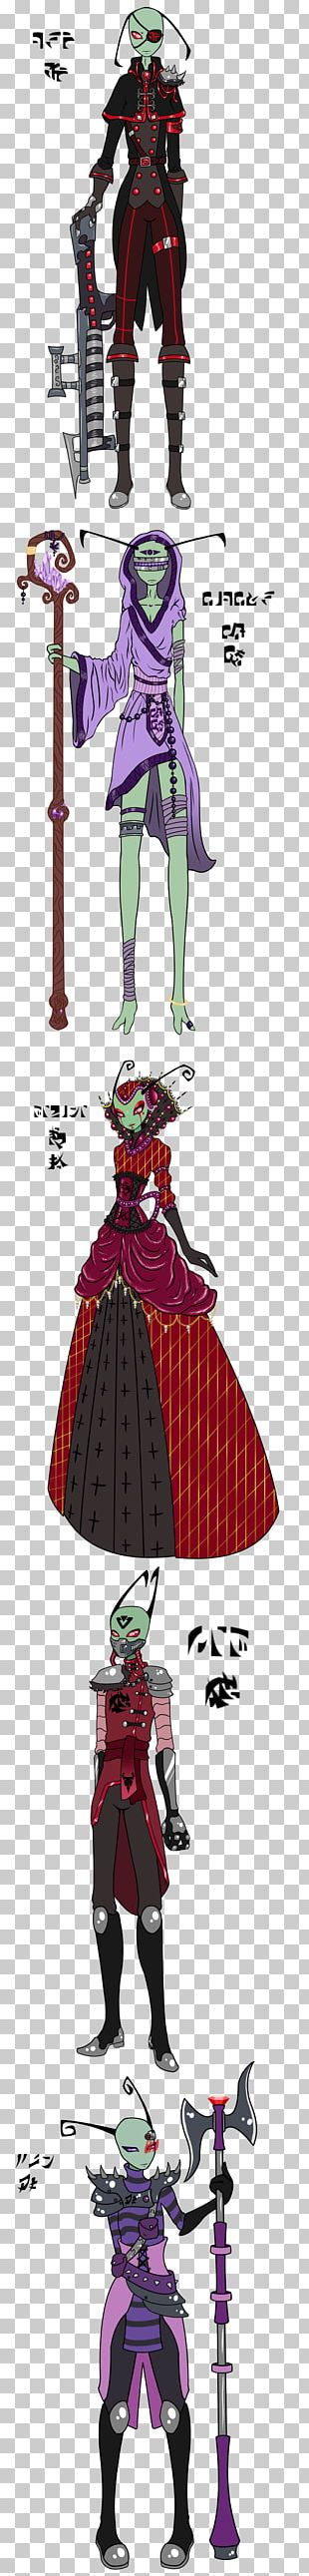 Costume Design Character Cartoon Fiction PNG